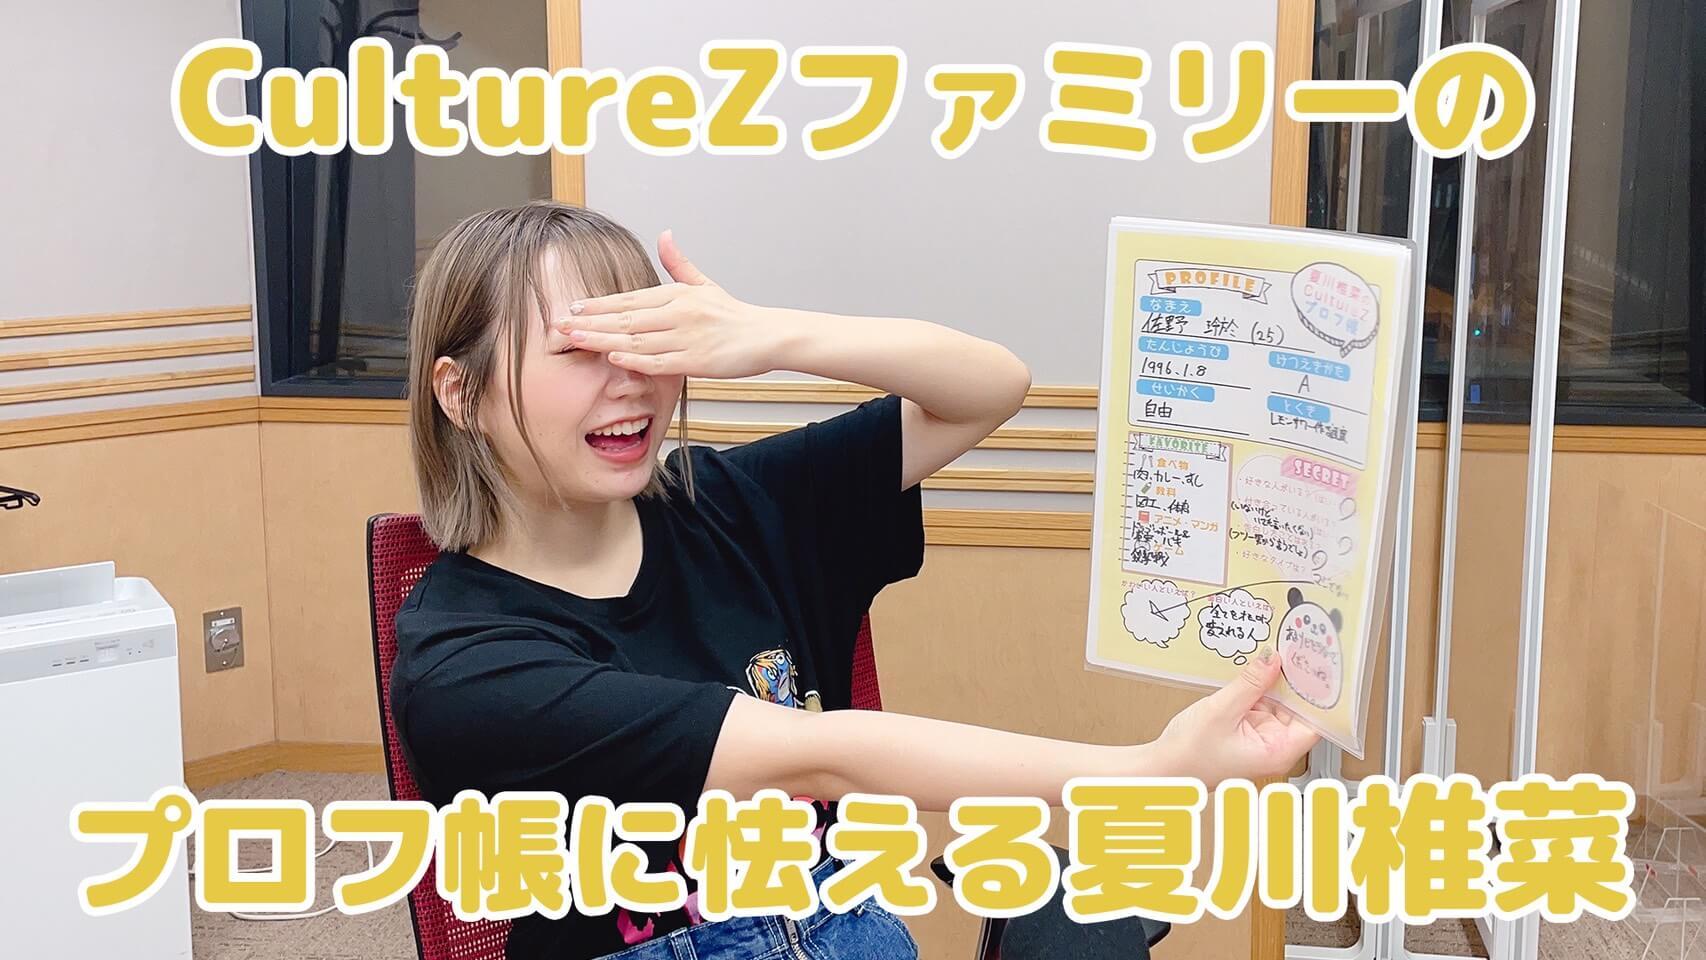 CultureZファミリーのプロフ帳に怯える夏川椎菜